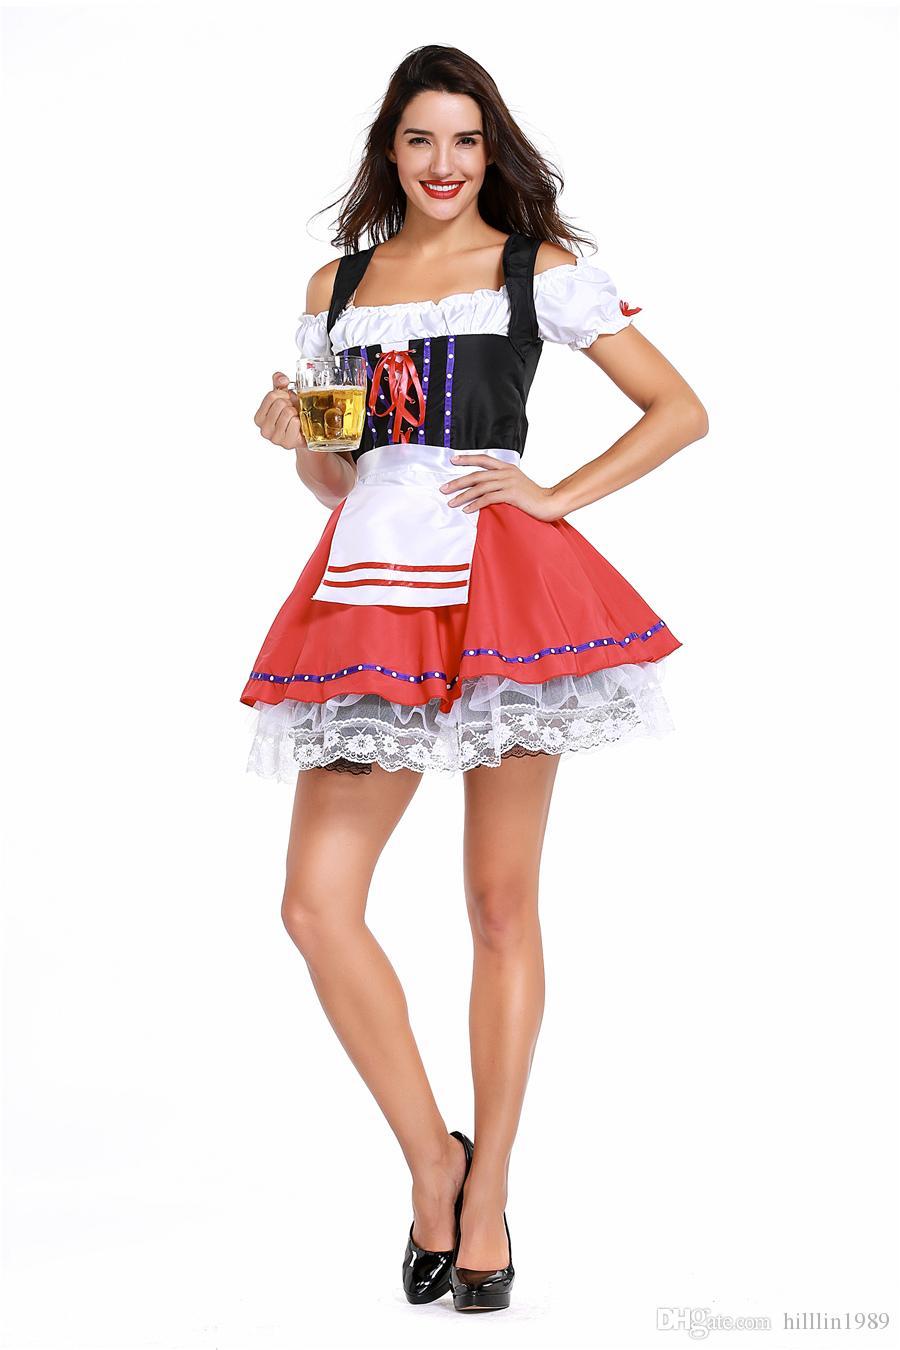 Women Carnival Sexy Short Oktoberfest Dress European Traditional Theme Costume German Bavarian Beer Girl Cosplay Uniform